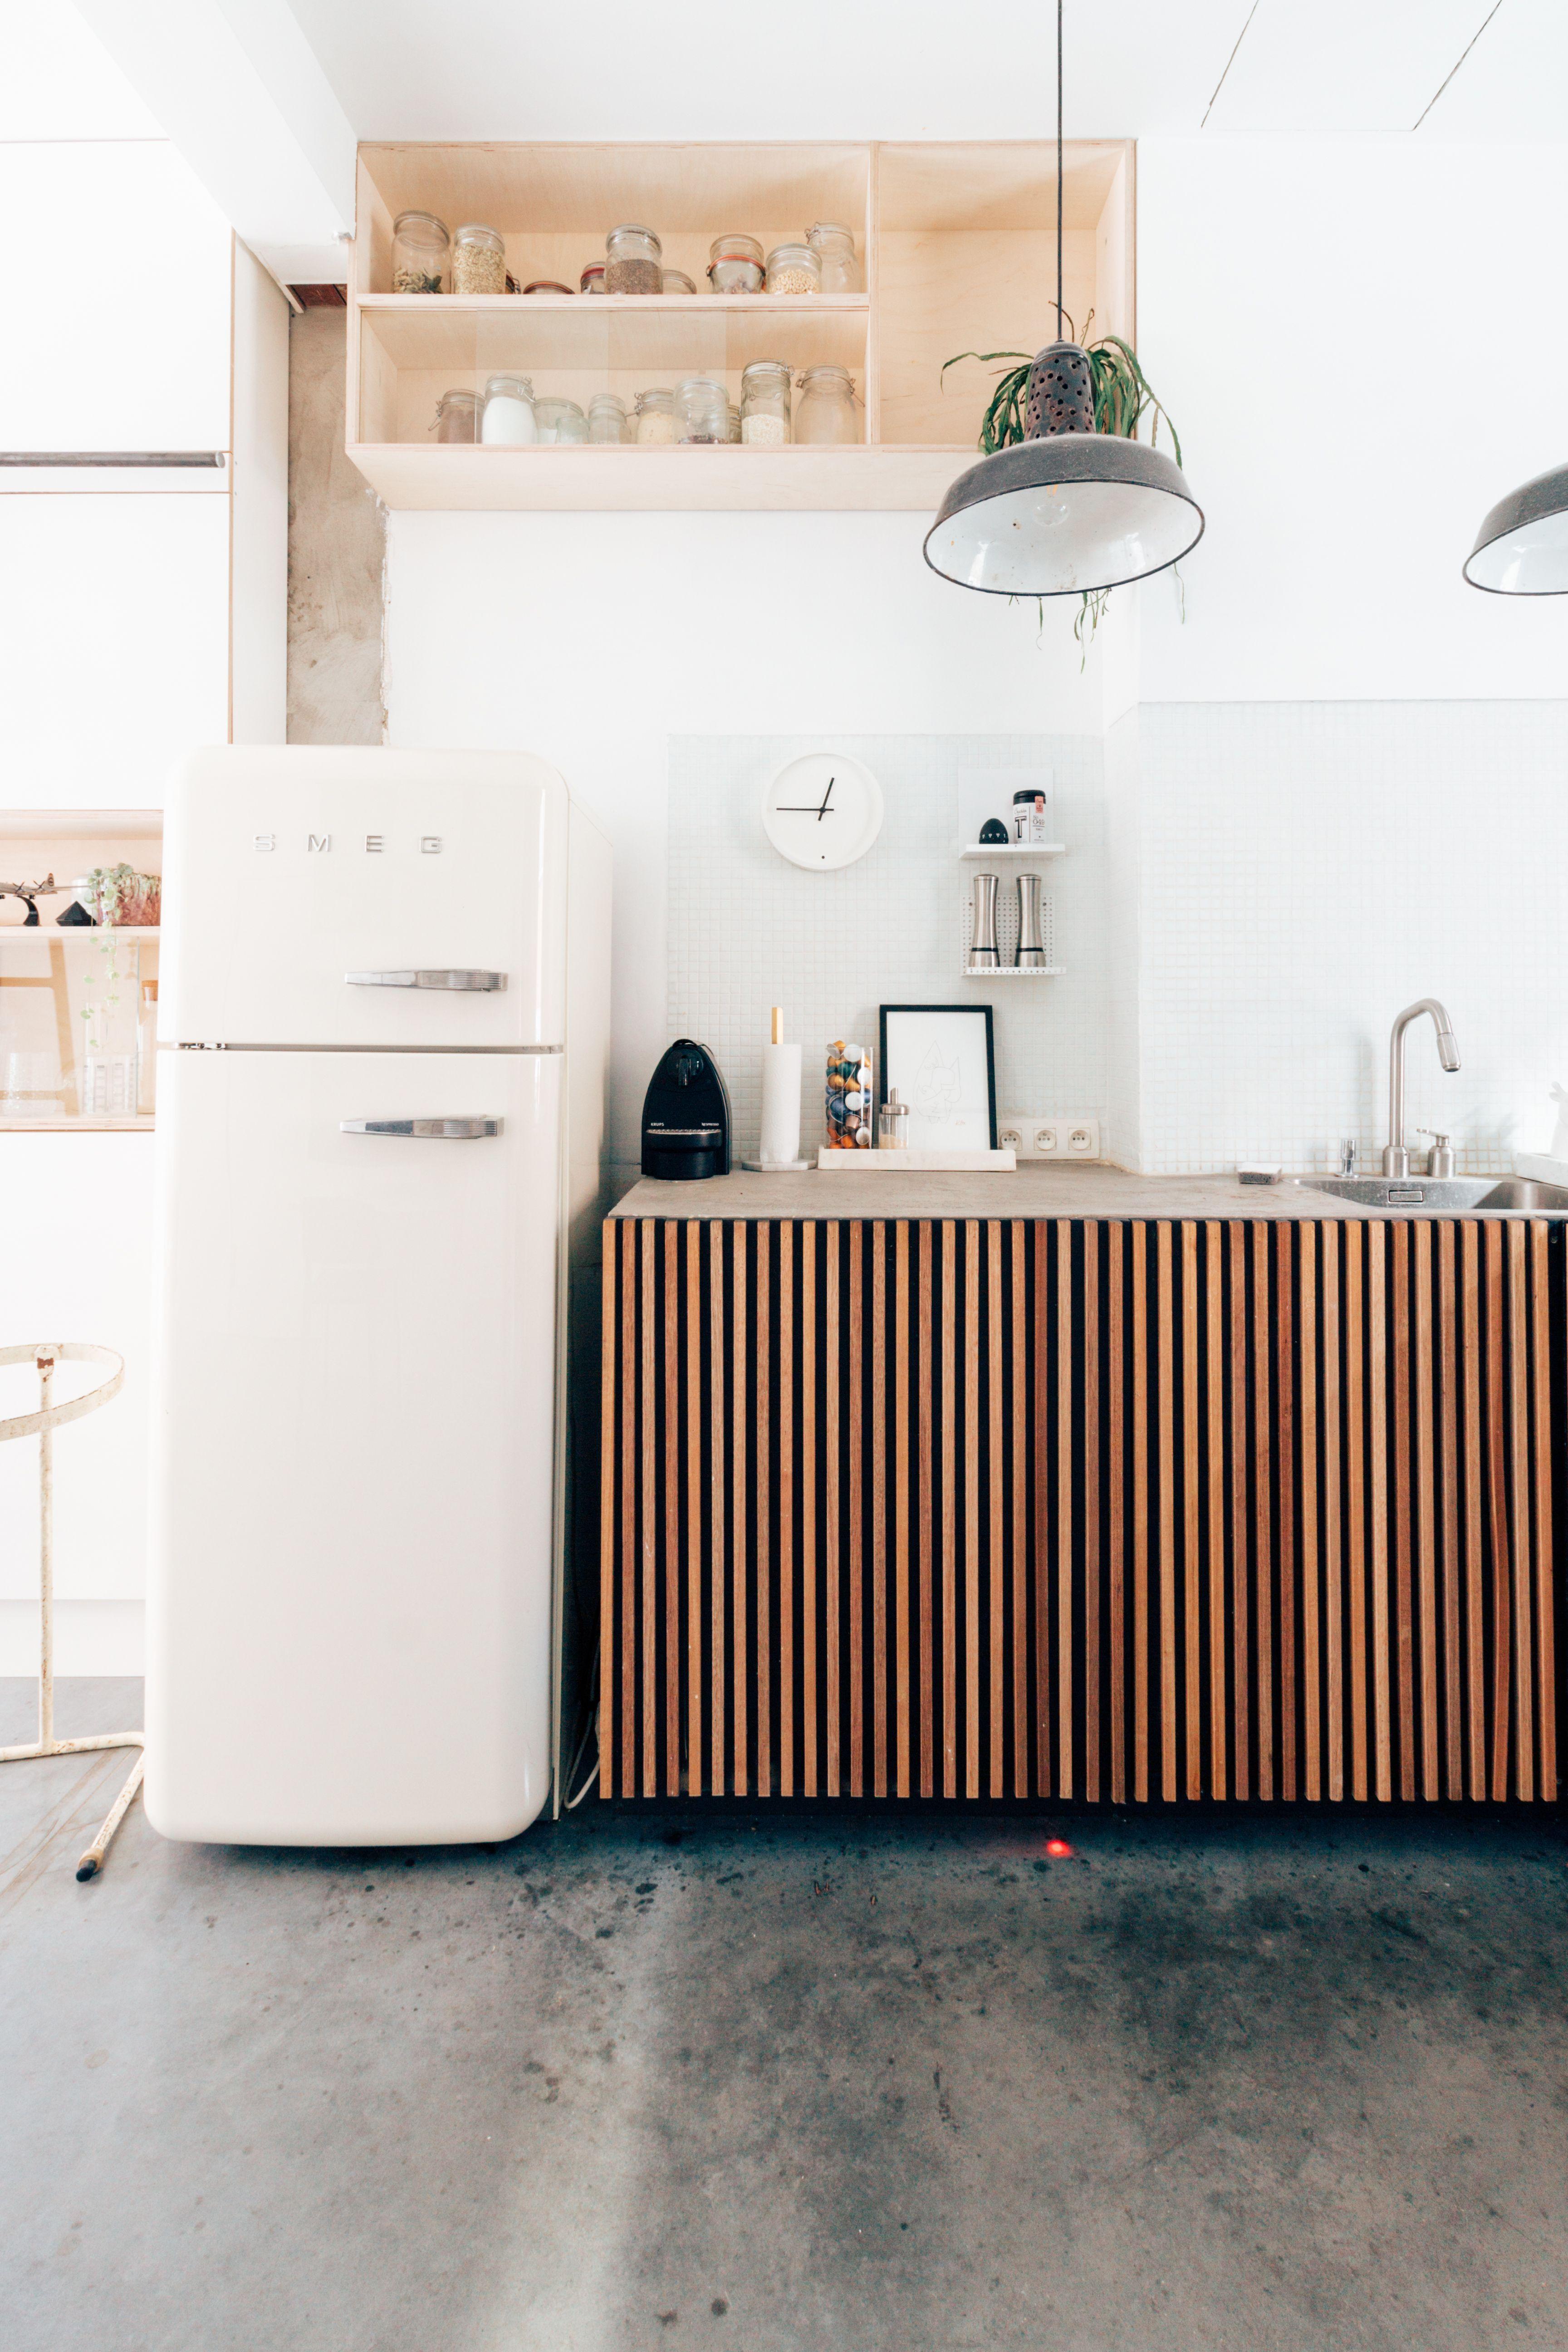 Deco Latte De Bois insights_ liene & william | heminredning kök, köksdesigner